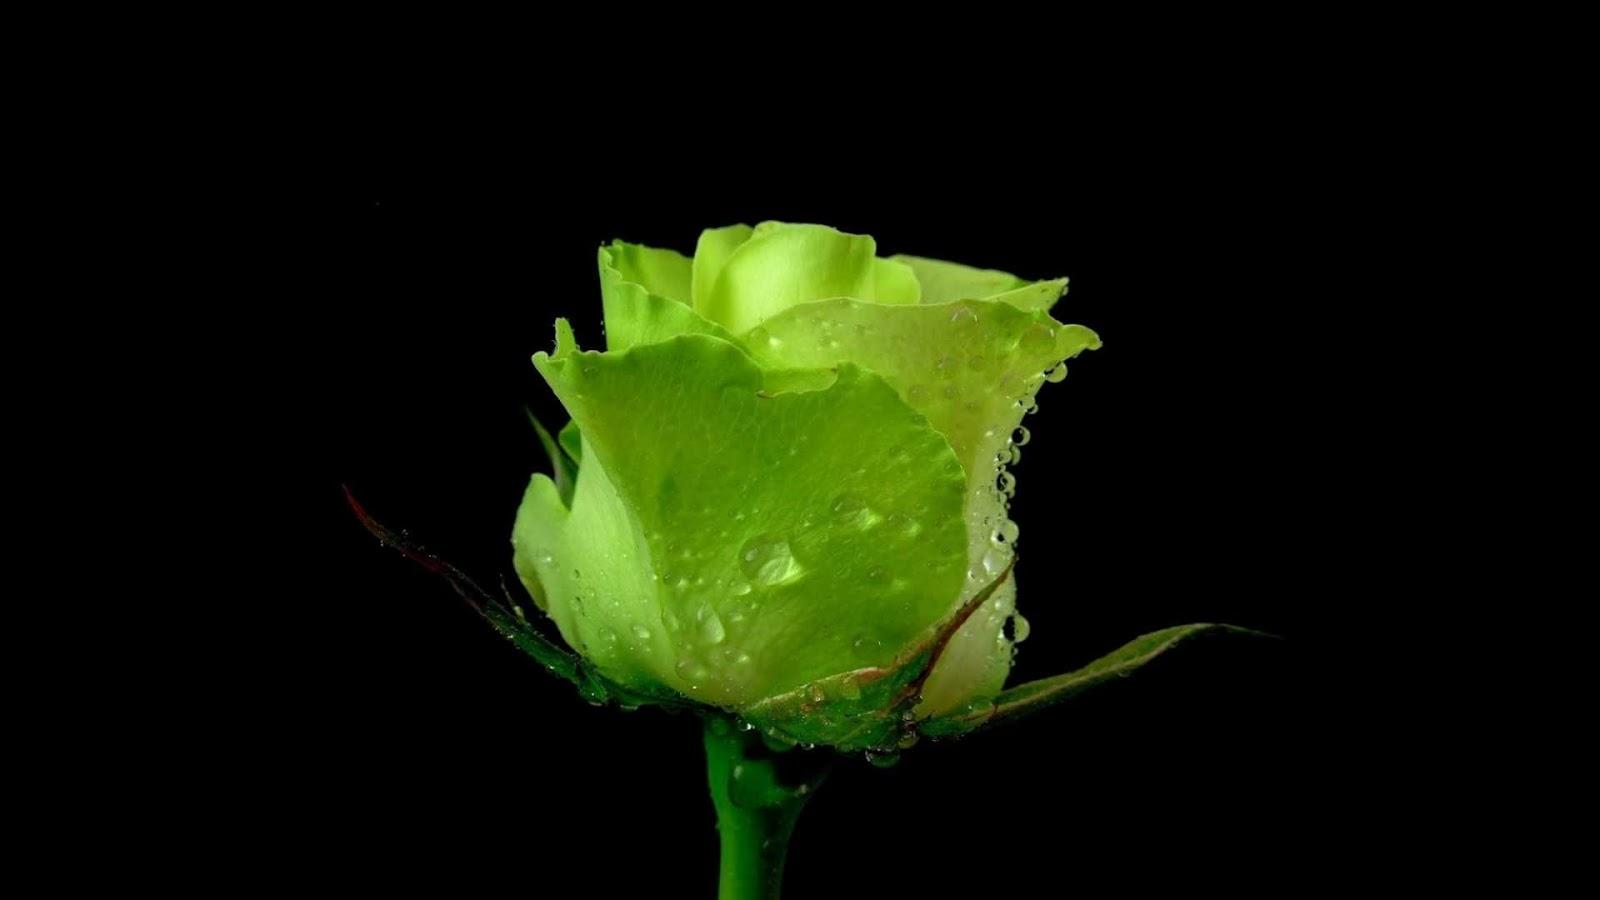 http://3.bp.blogspot.com/-W47I2C2pLLY/UNE6w7oPKmI/AAAAAAAAZrI/OBsh_1P0dts/s1600/30-flores-rosas-full-hd-mayo-dia-de-la-madre-22+-+fondowallpaper.blogspot.com.jpg